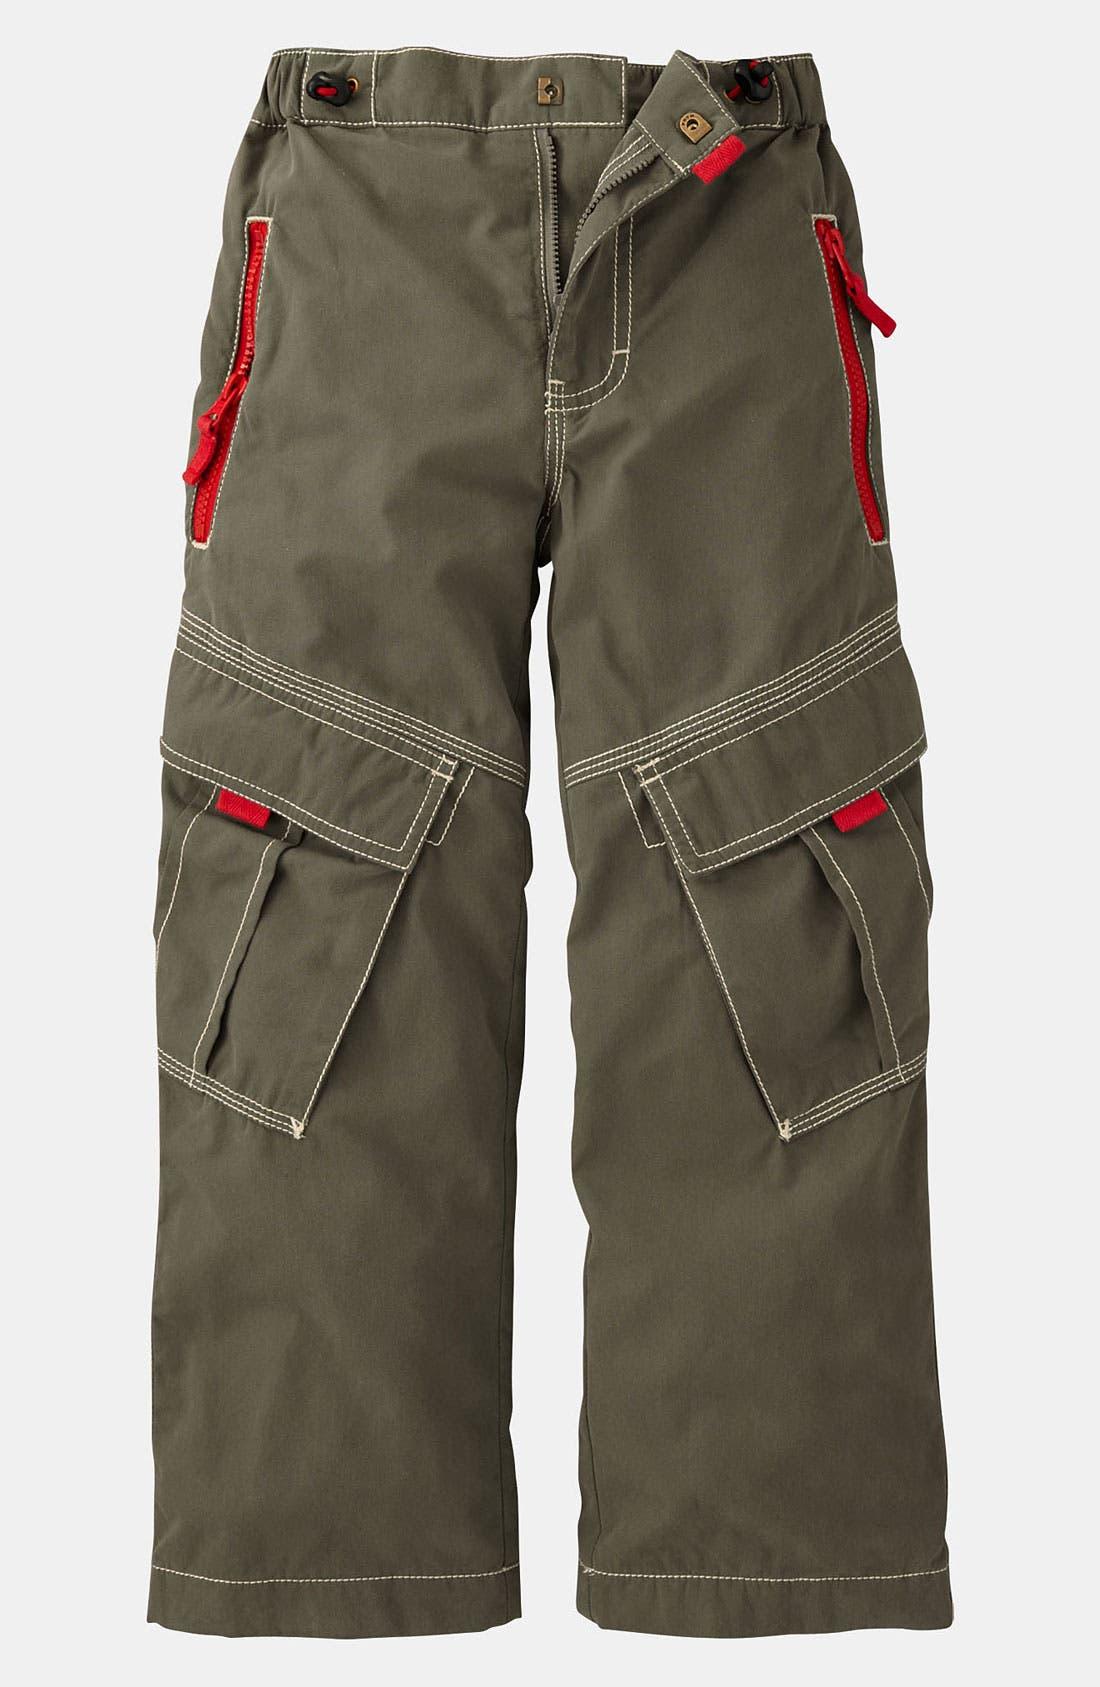 Alternate Image 1 Selected - Mini Boden Lined Skate Pants (Toddler)